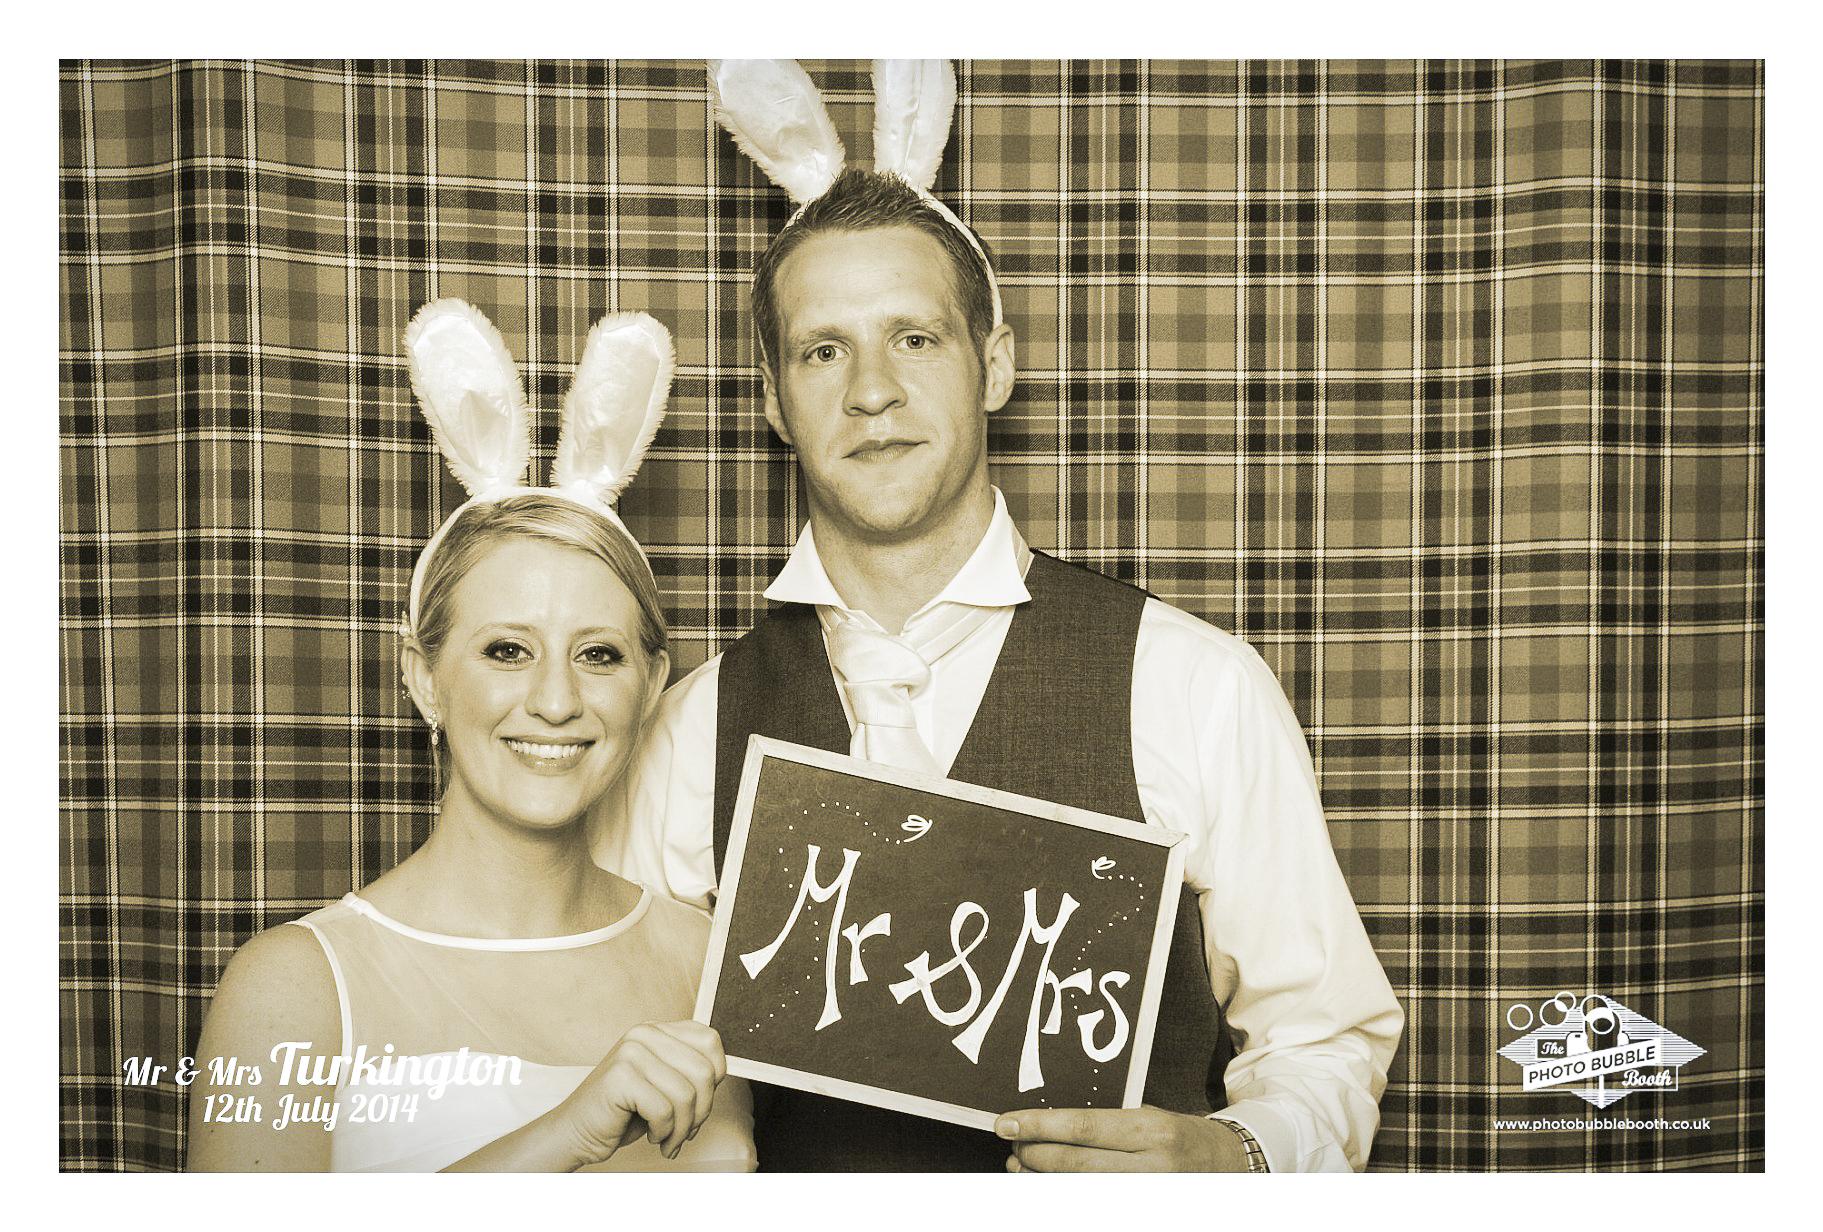 Mr & Mrs Turkington Photobooth _15.JPG